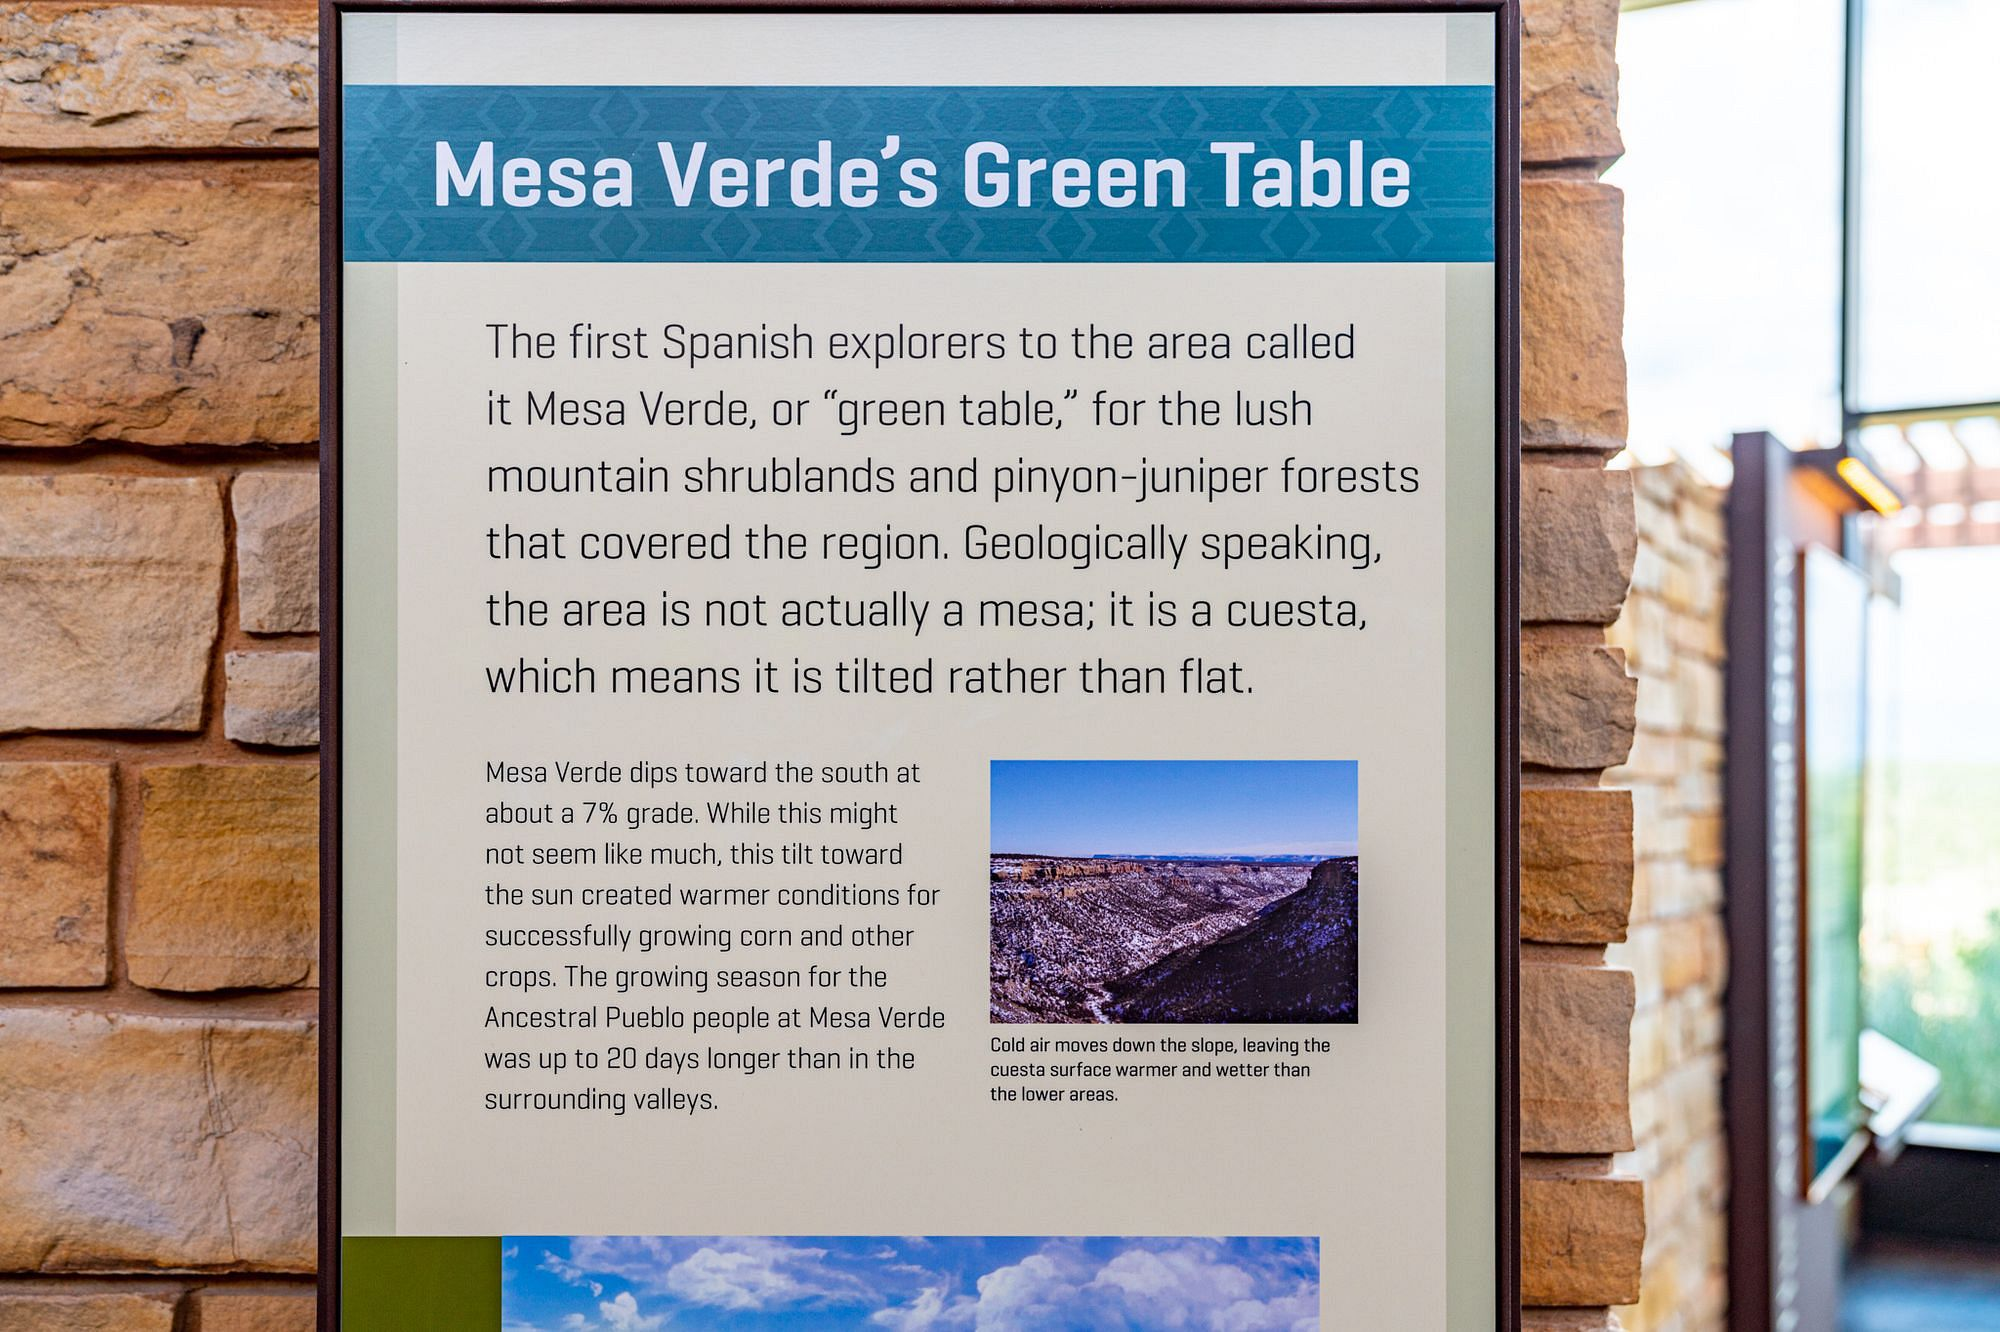 Mesa Verde's Green Table